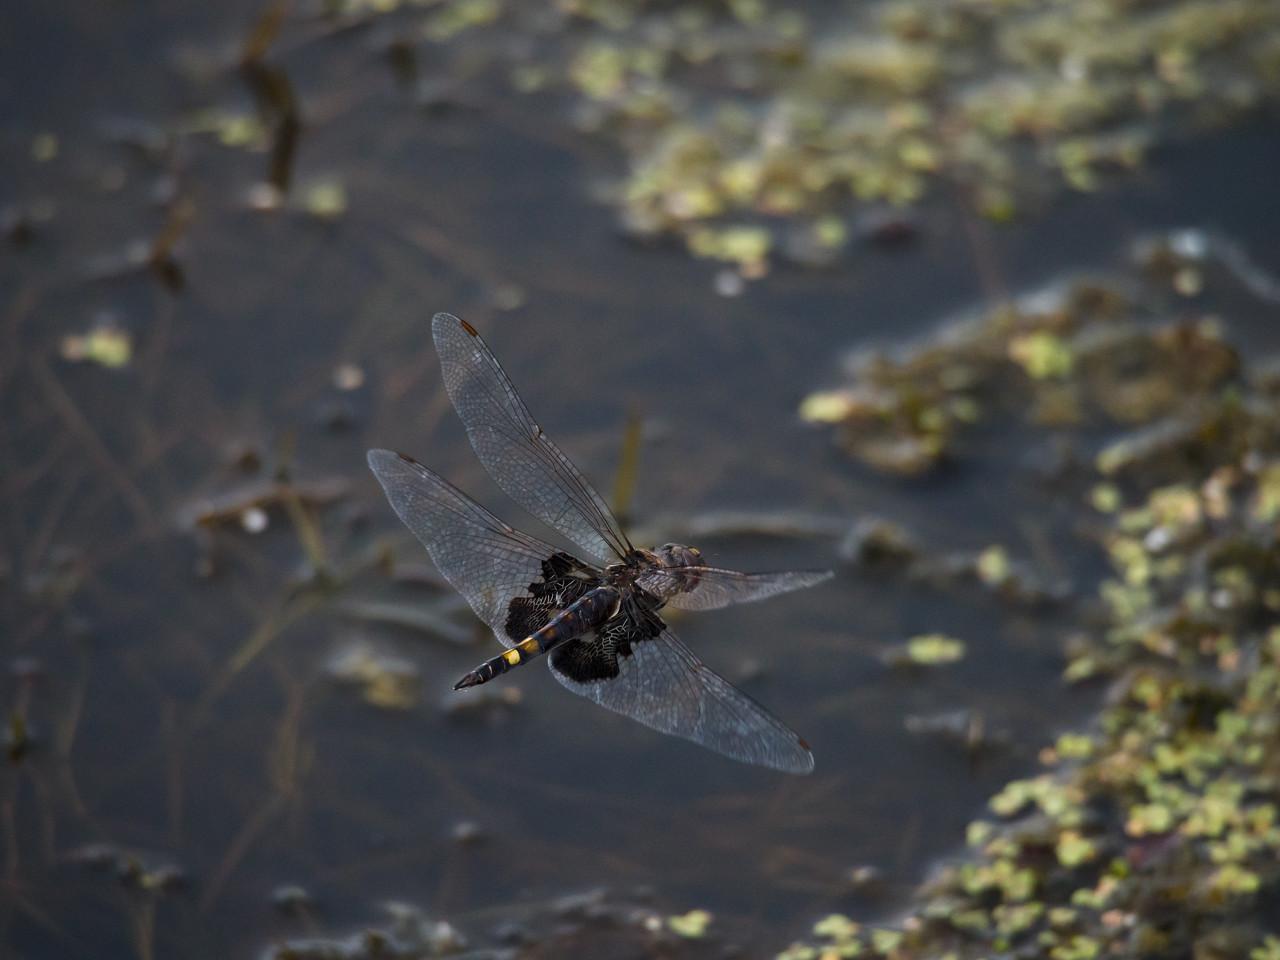 Black Saddlebags dragonfly flying